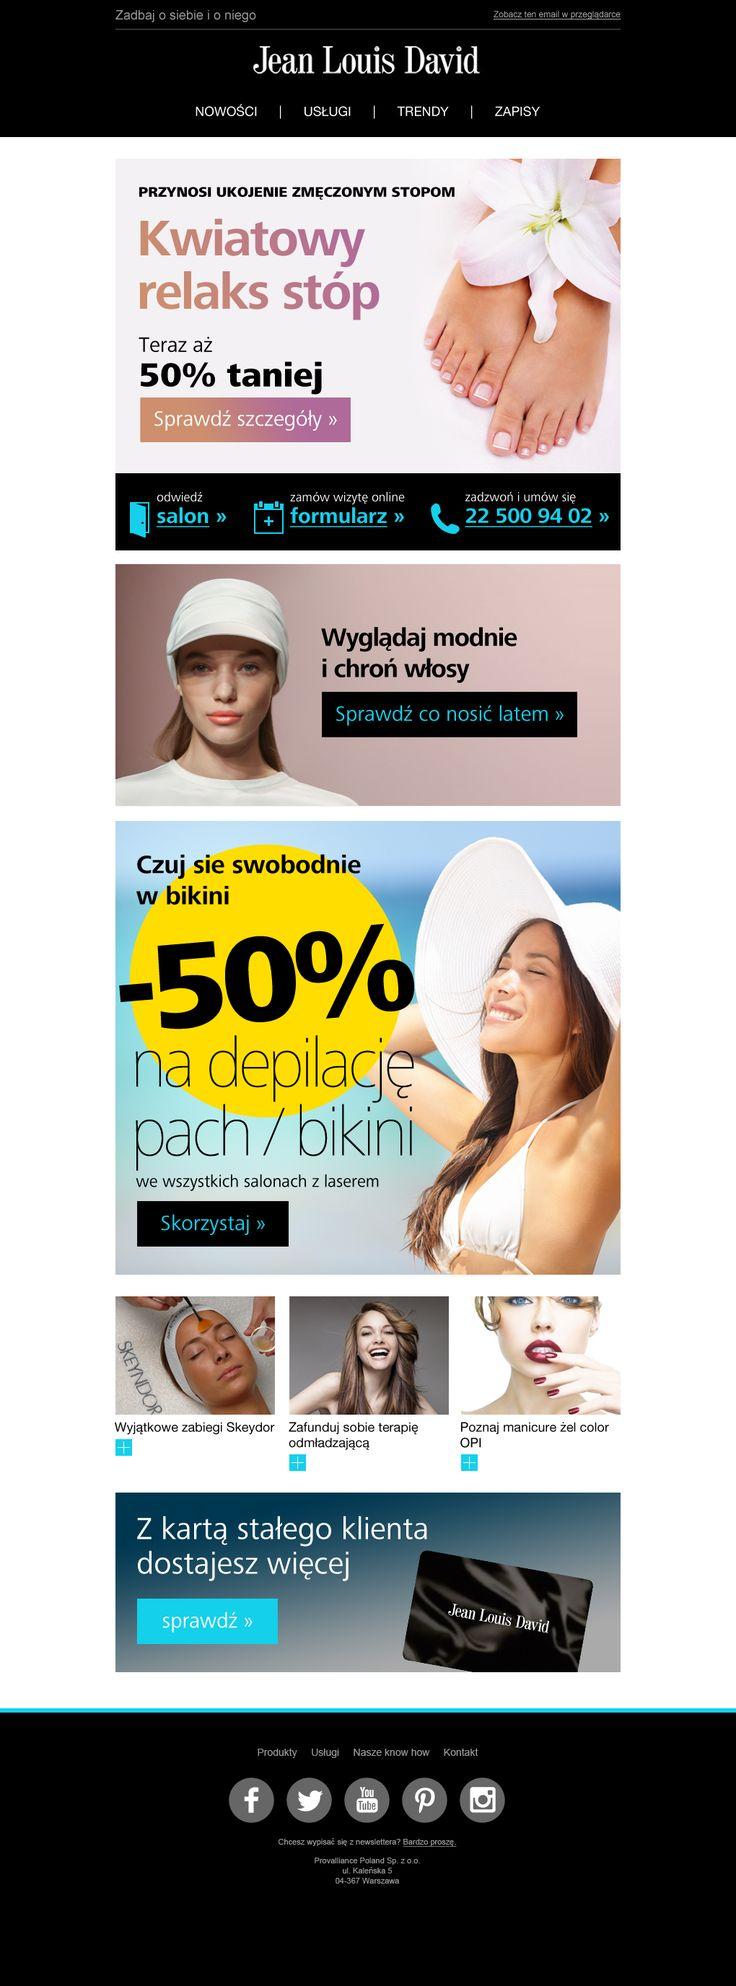 Letnie promocje i content na lato od Jean Louis David.  #newsletter #email #ecommerce #jeanlouisdavid #template